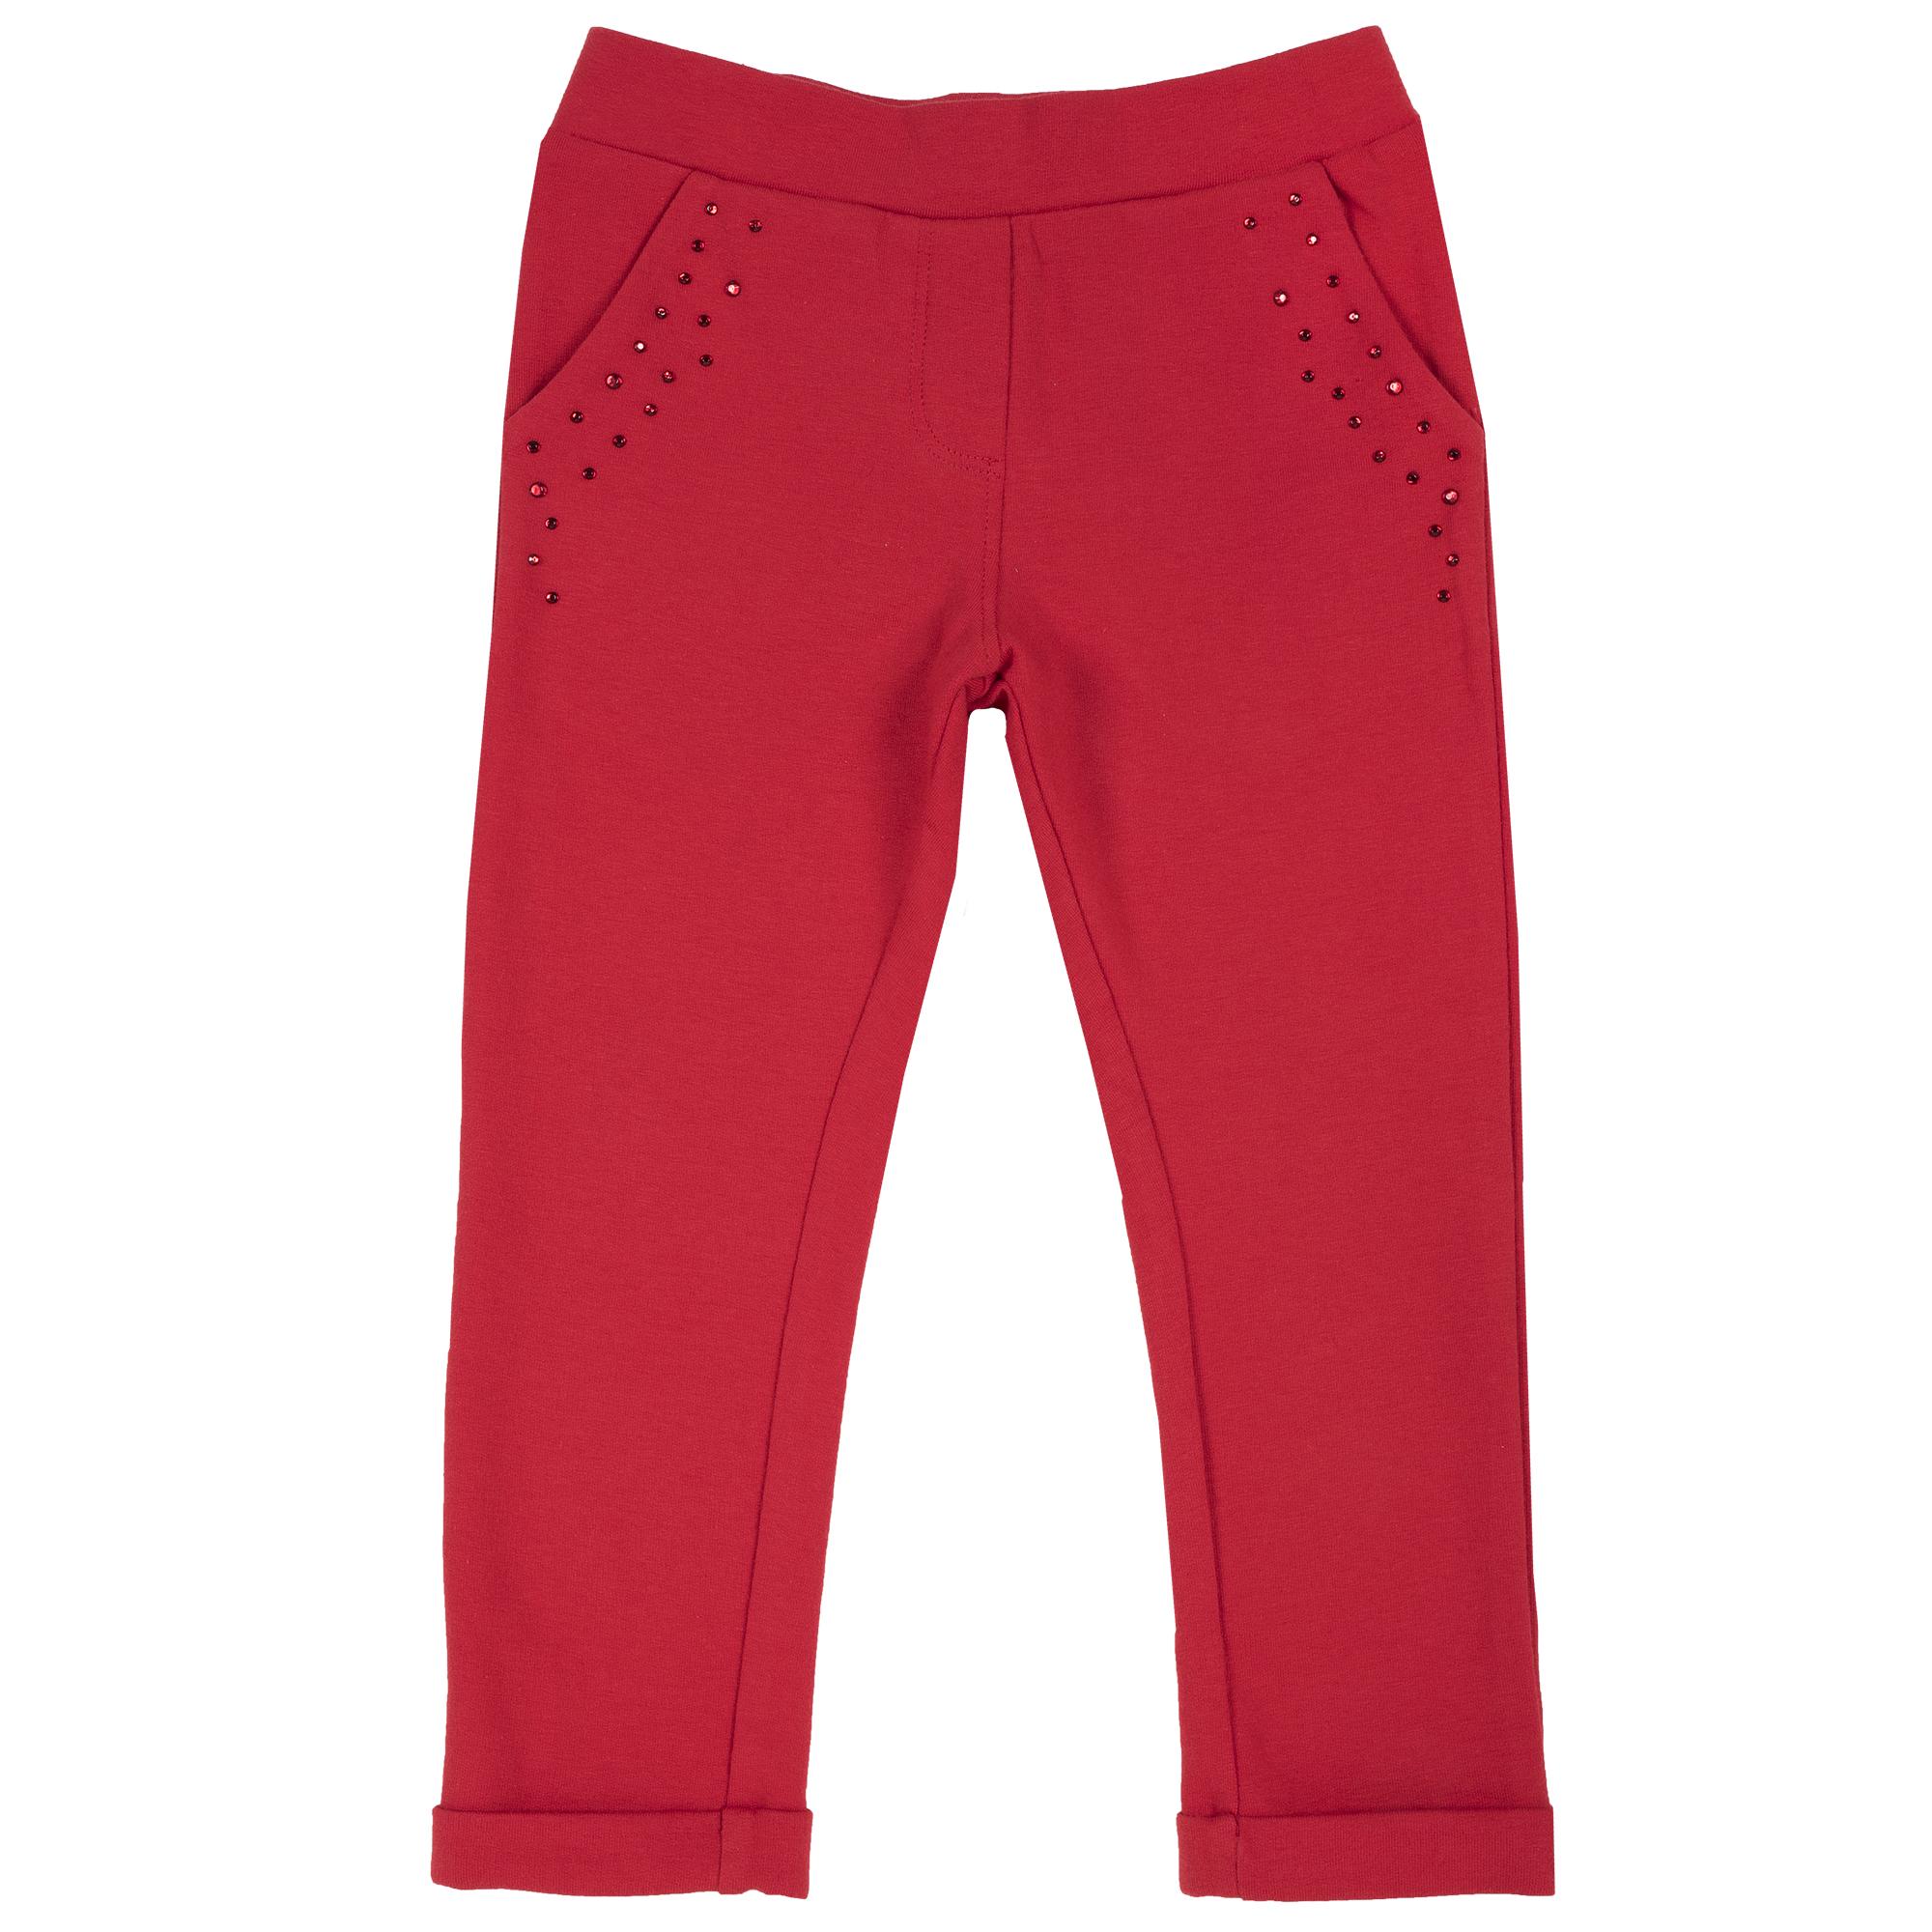 Pantalon lung copii Chicco, rosu, 24957 din categoria Pantaloni copii